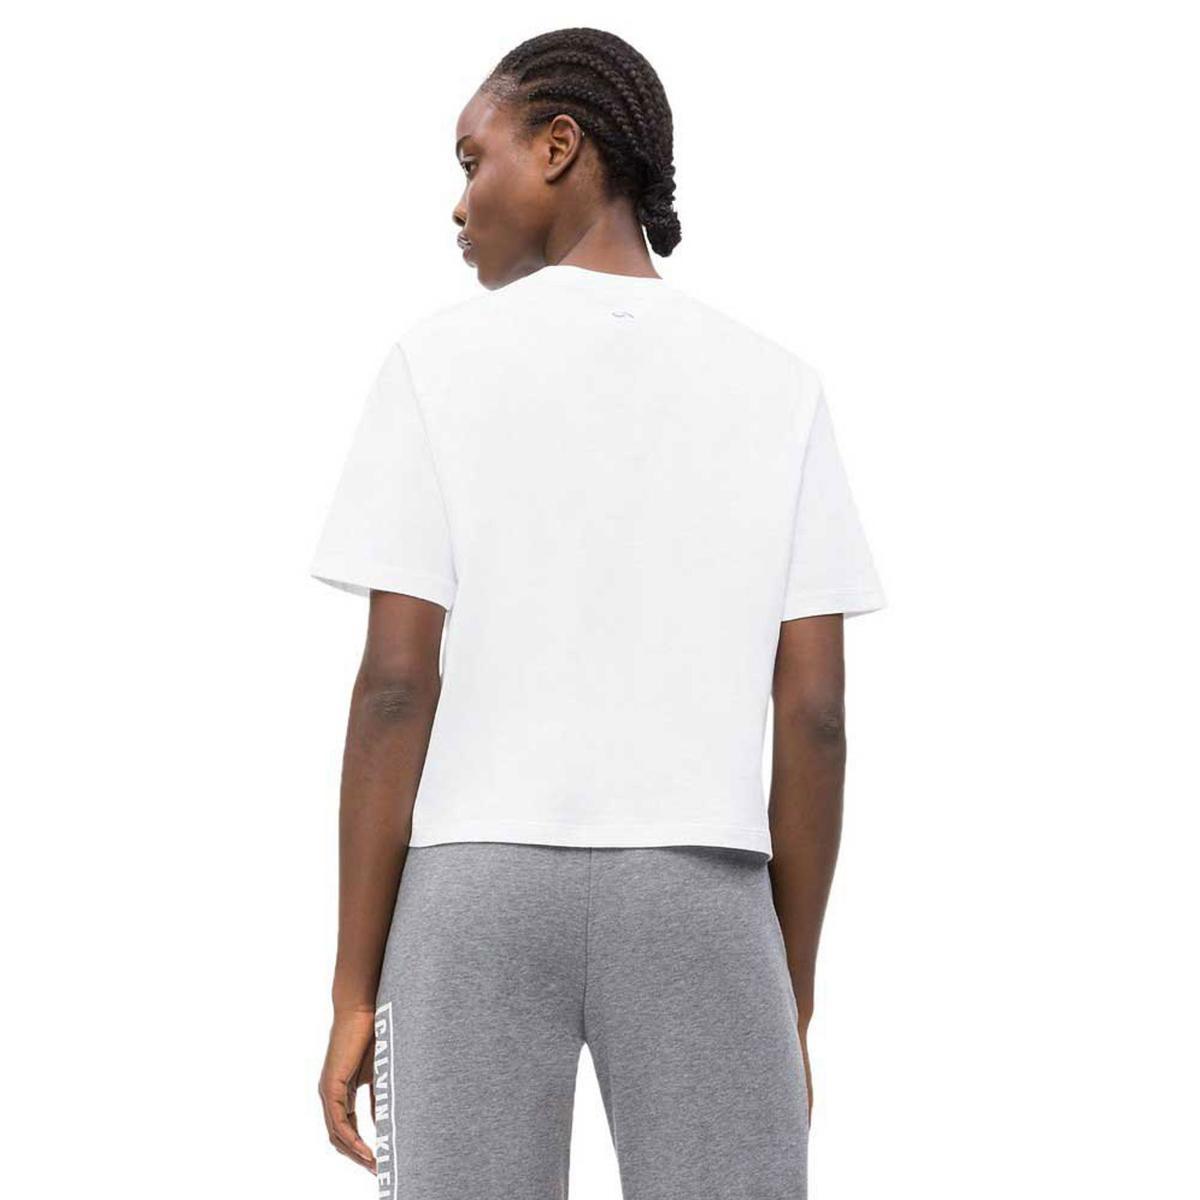 T-shirt Calvin Klein Performance in cotone con logo da donna rif. 00GWS9K103